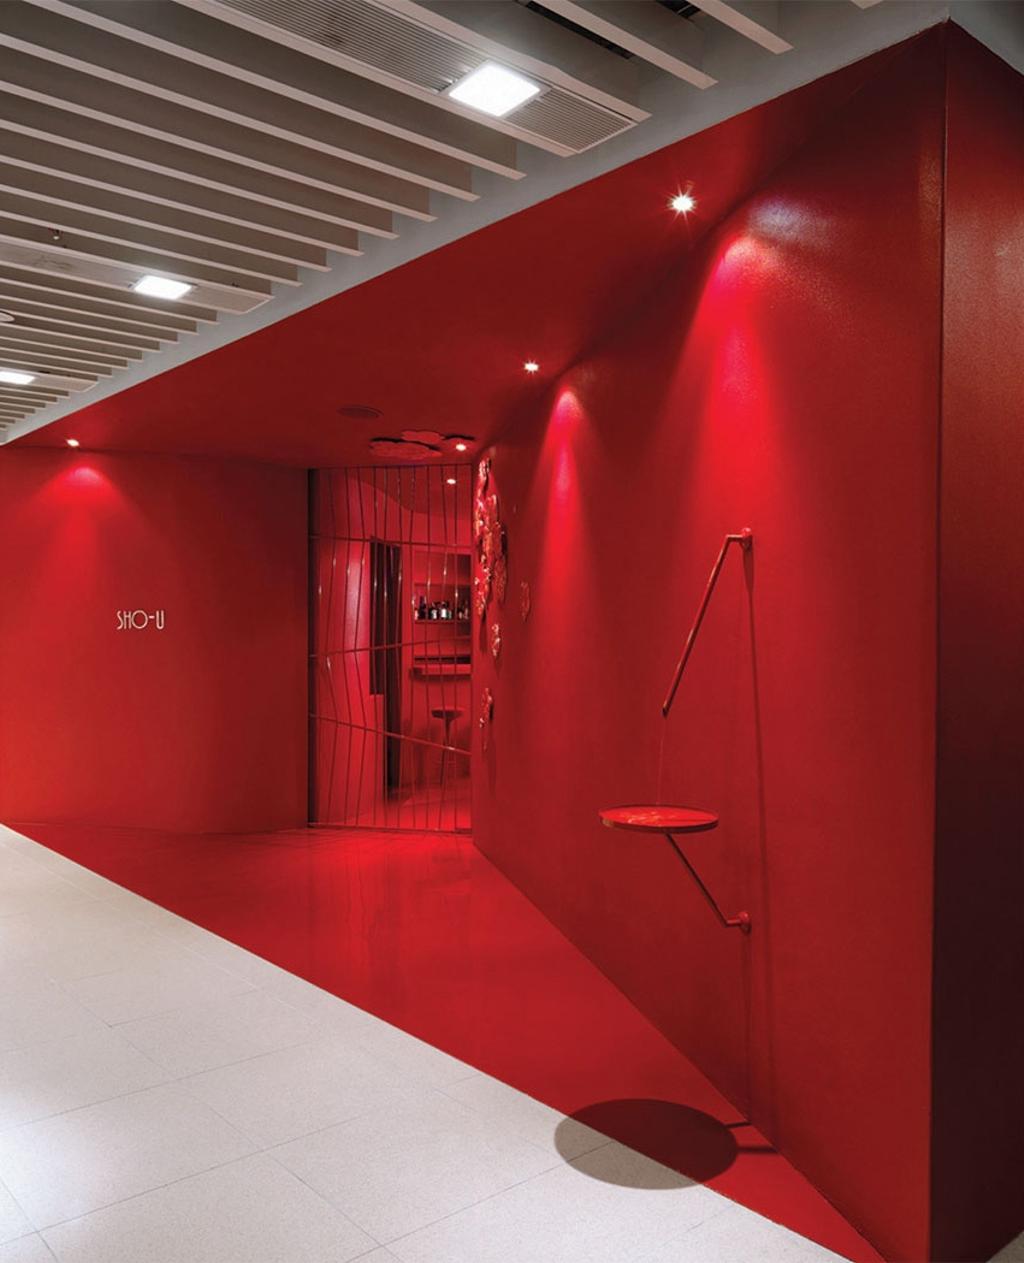 Sho-U Restaurant, Commercial, Architect, Ministry of Design, Transitional, Corridor